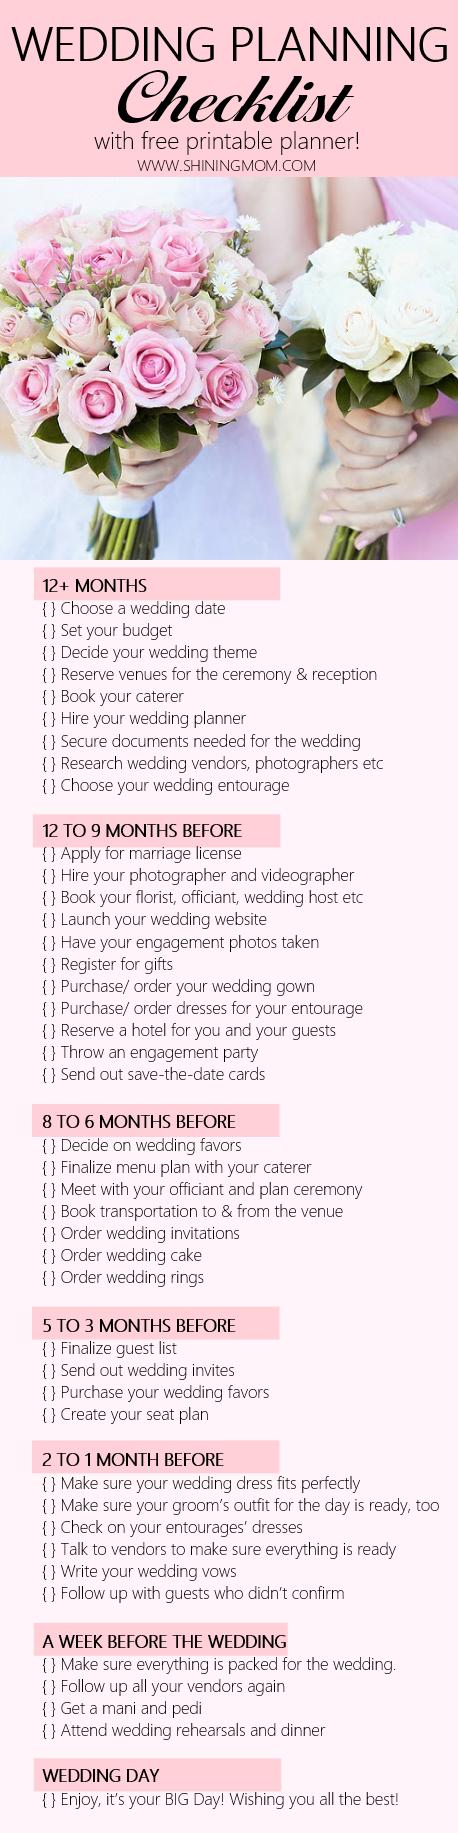 Free Printable Wedding Planner With Wedding Checklist